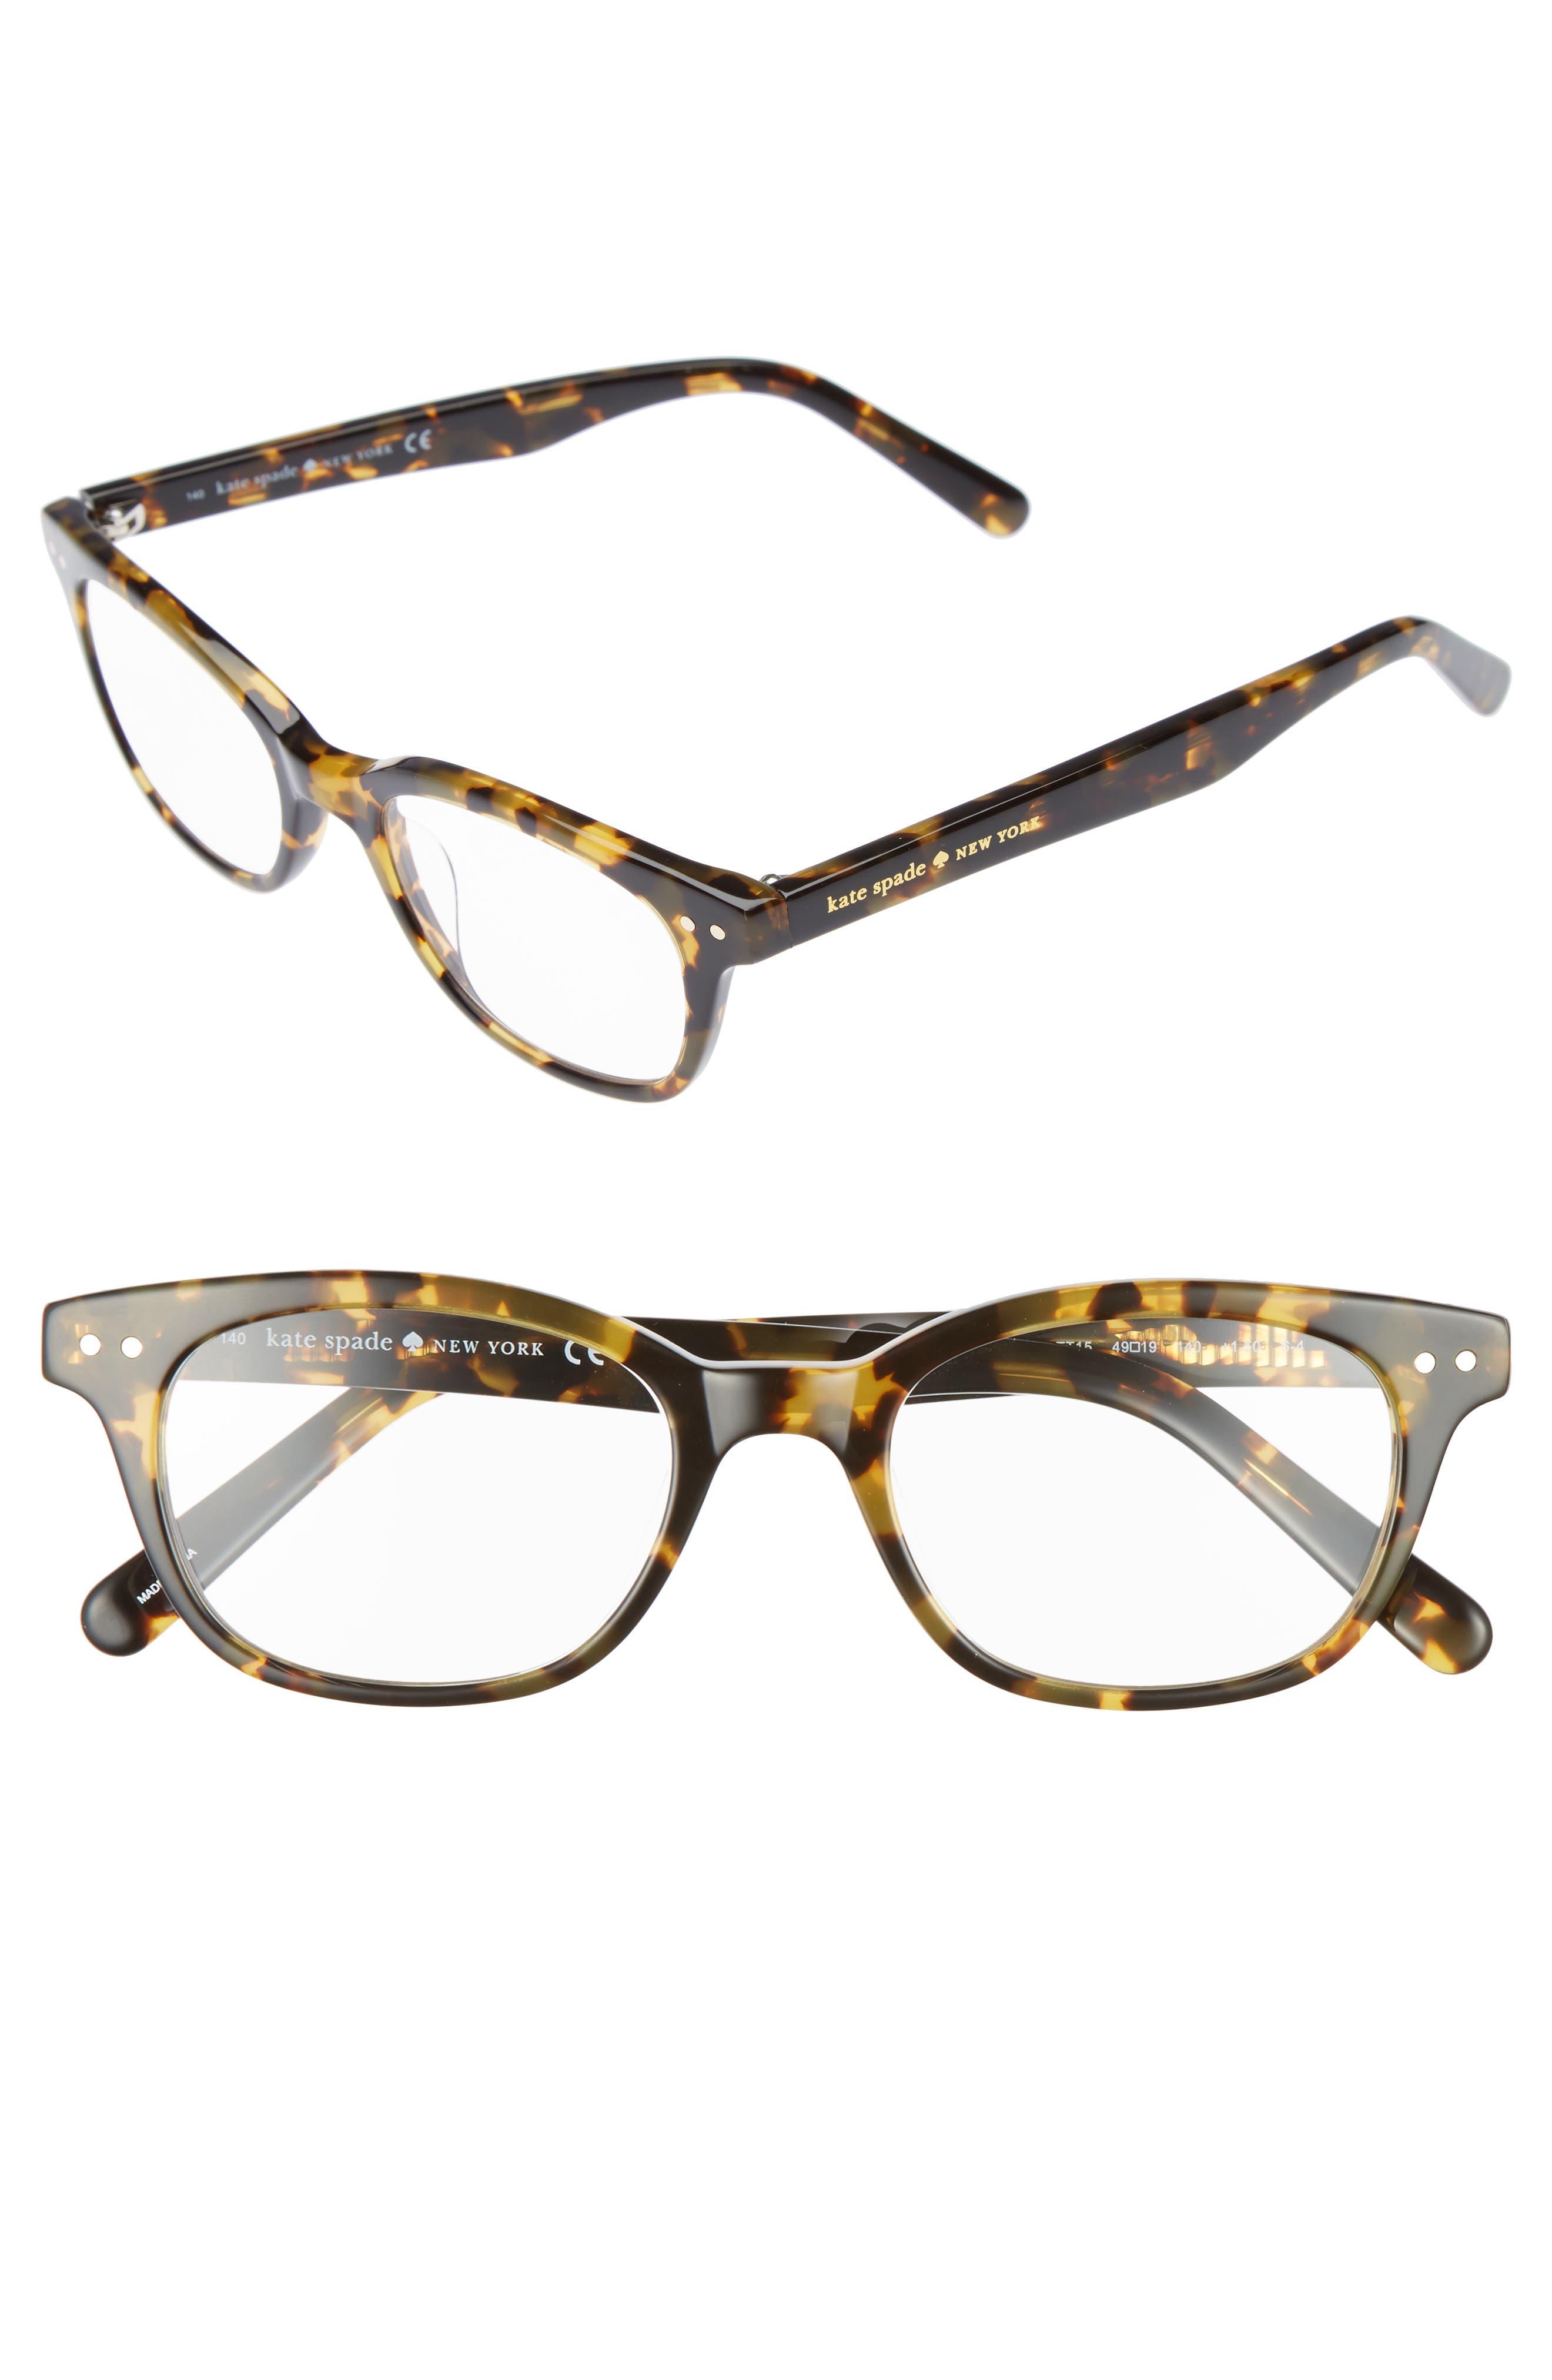 cbd8370ef08 Kate Spade New York Prescription Eyewear Frames UPC   Barcode ...